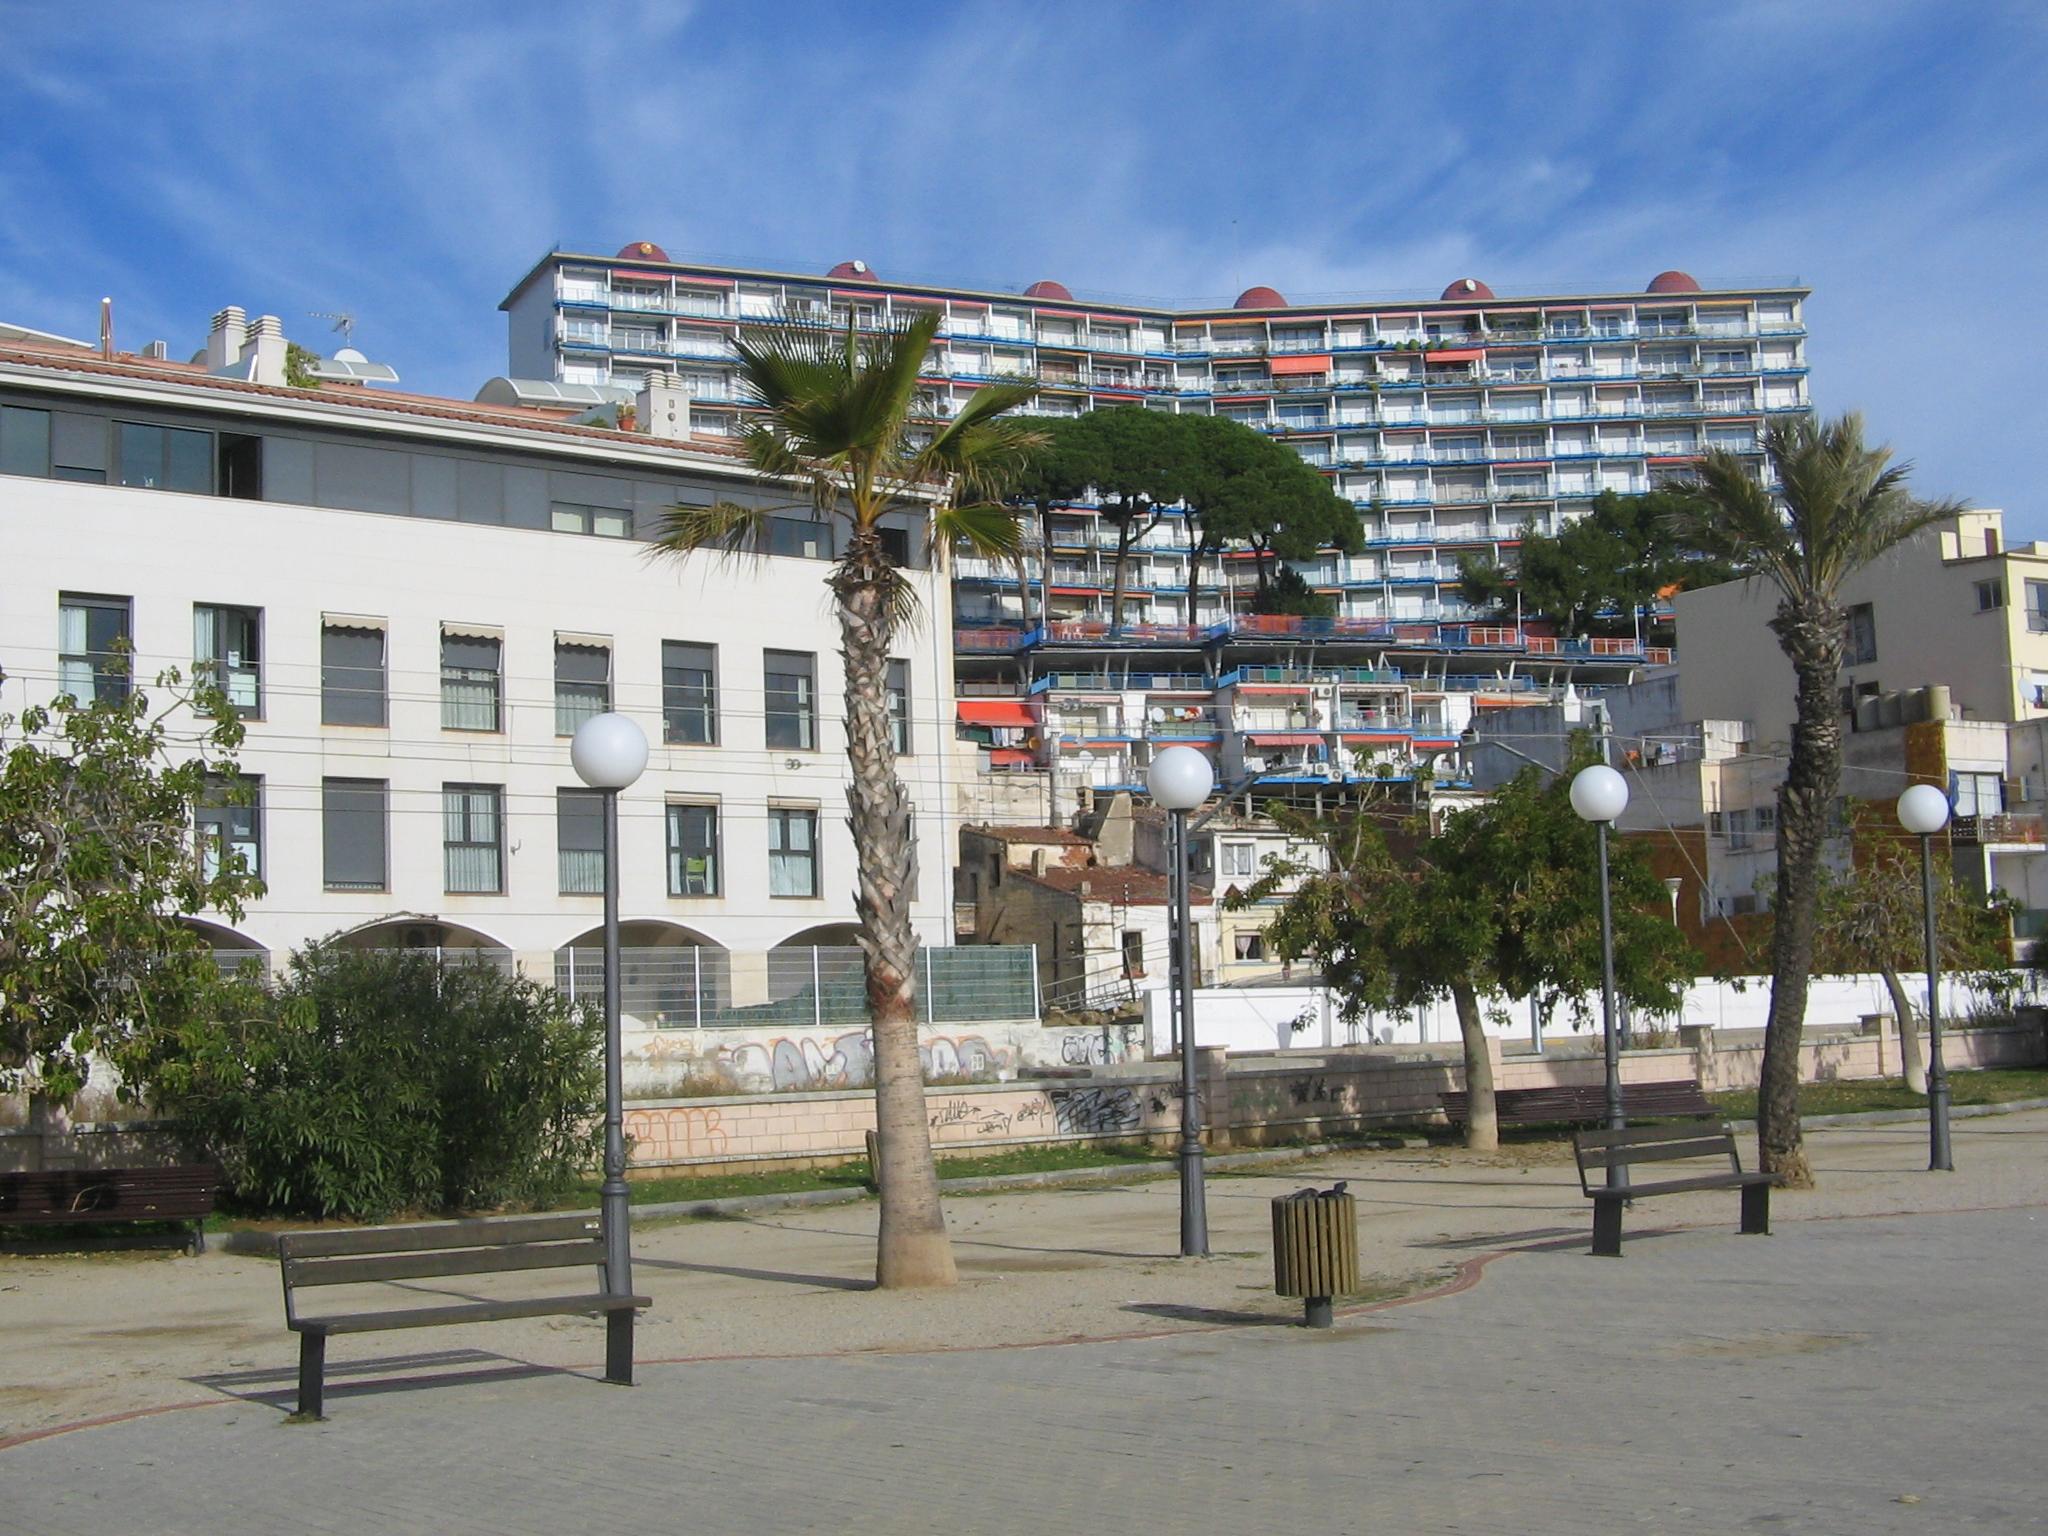 Playa El Cavaió / Tercera Playa